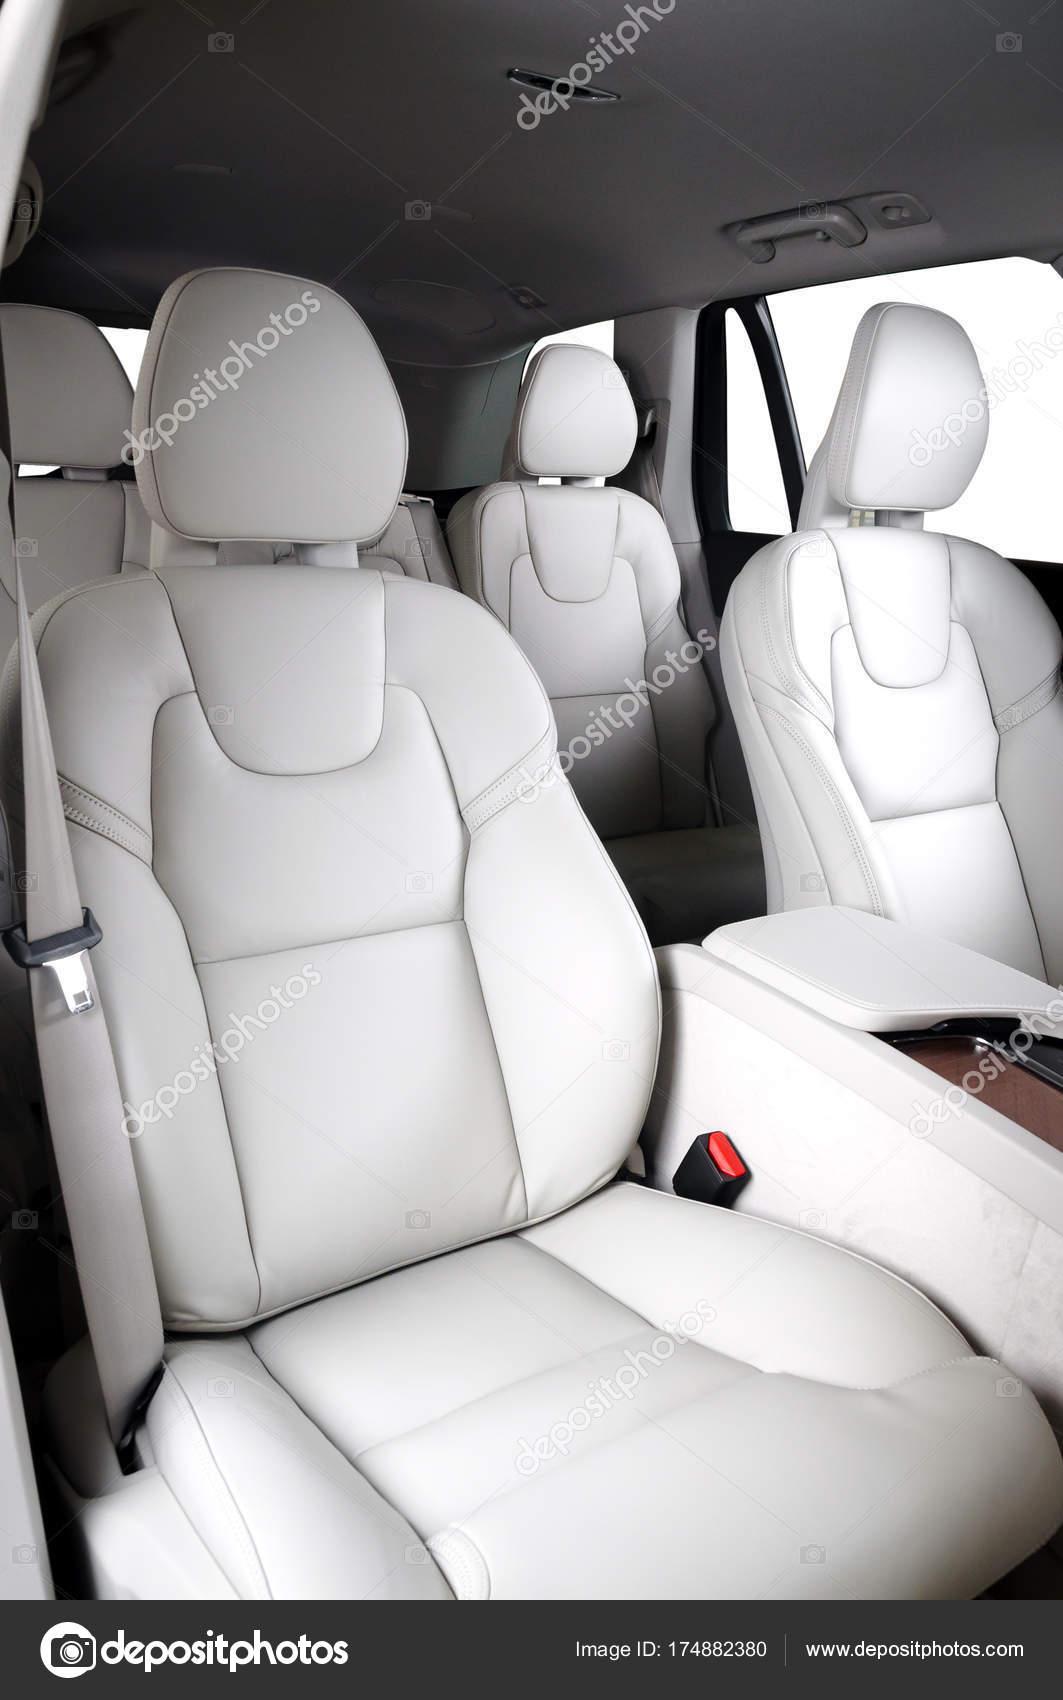 Luxury Car Interior Prestige Modern Car Comfortable Leather Seats White Stock Photo Image By C Gargantiopa1 174882380